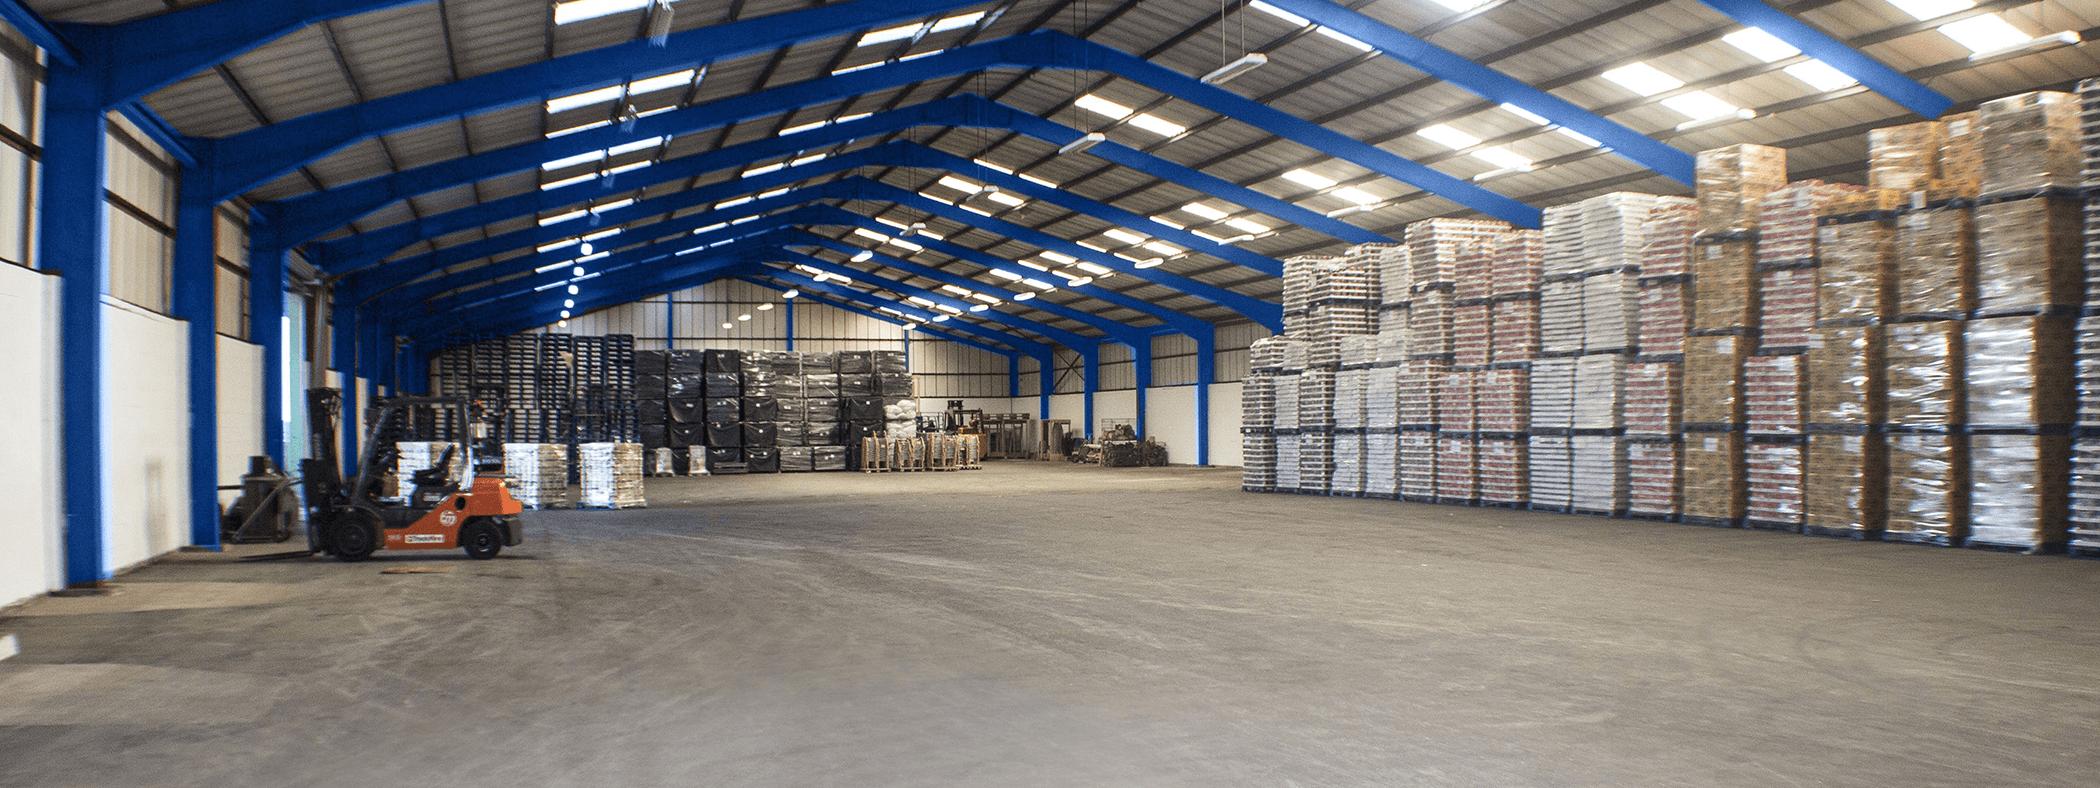 Storage and distribution